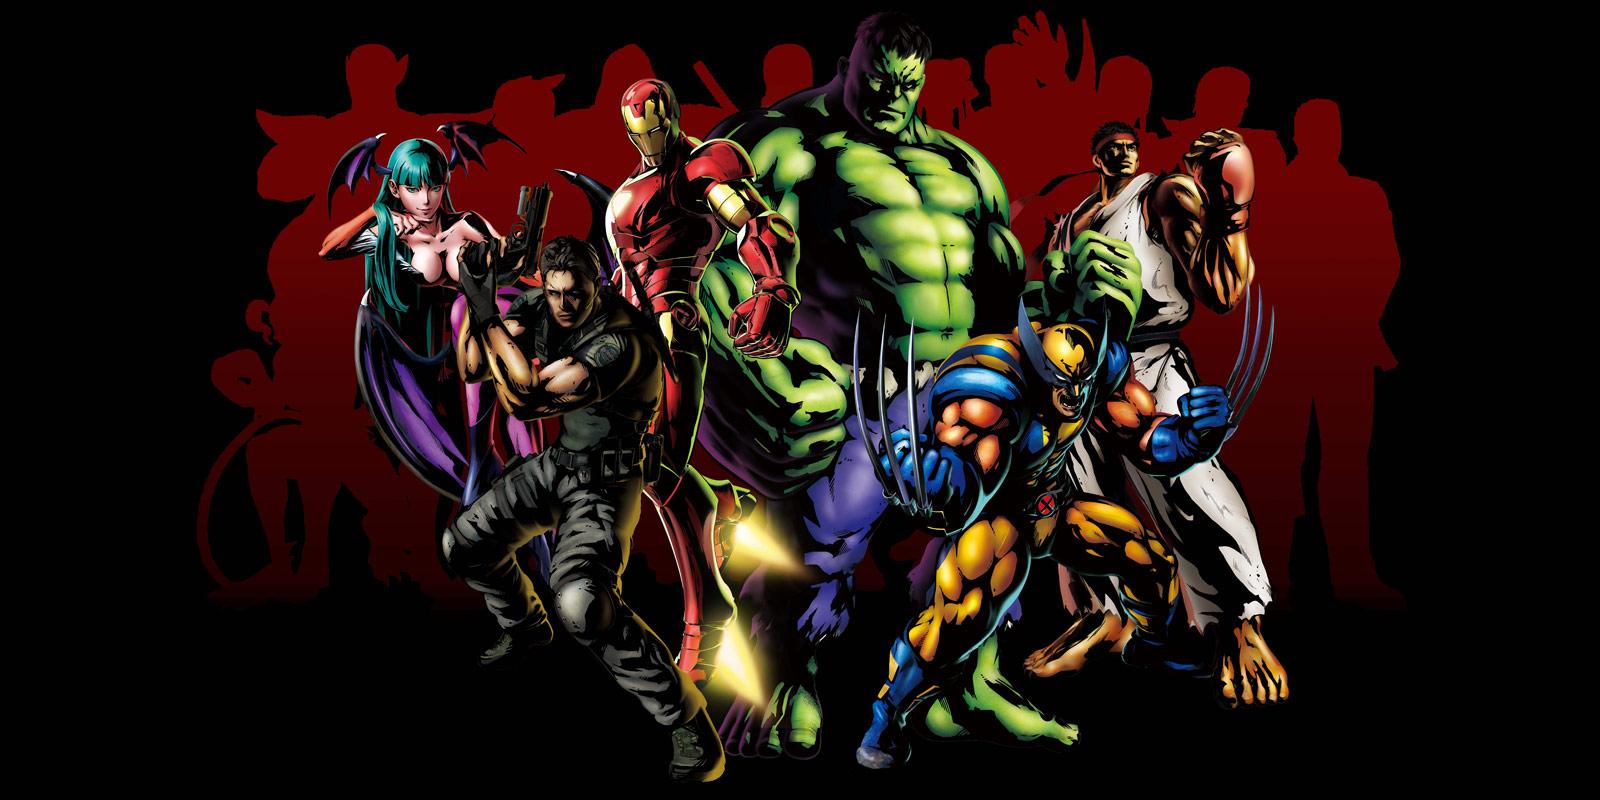 Marvel vs. Capcom 3 collage artwork #2